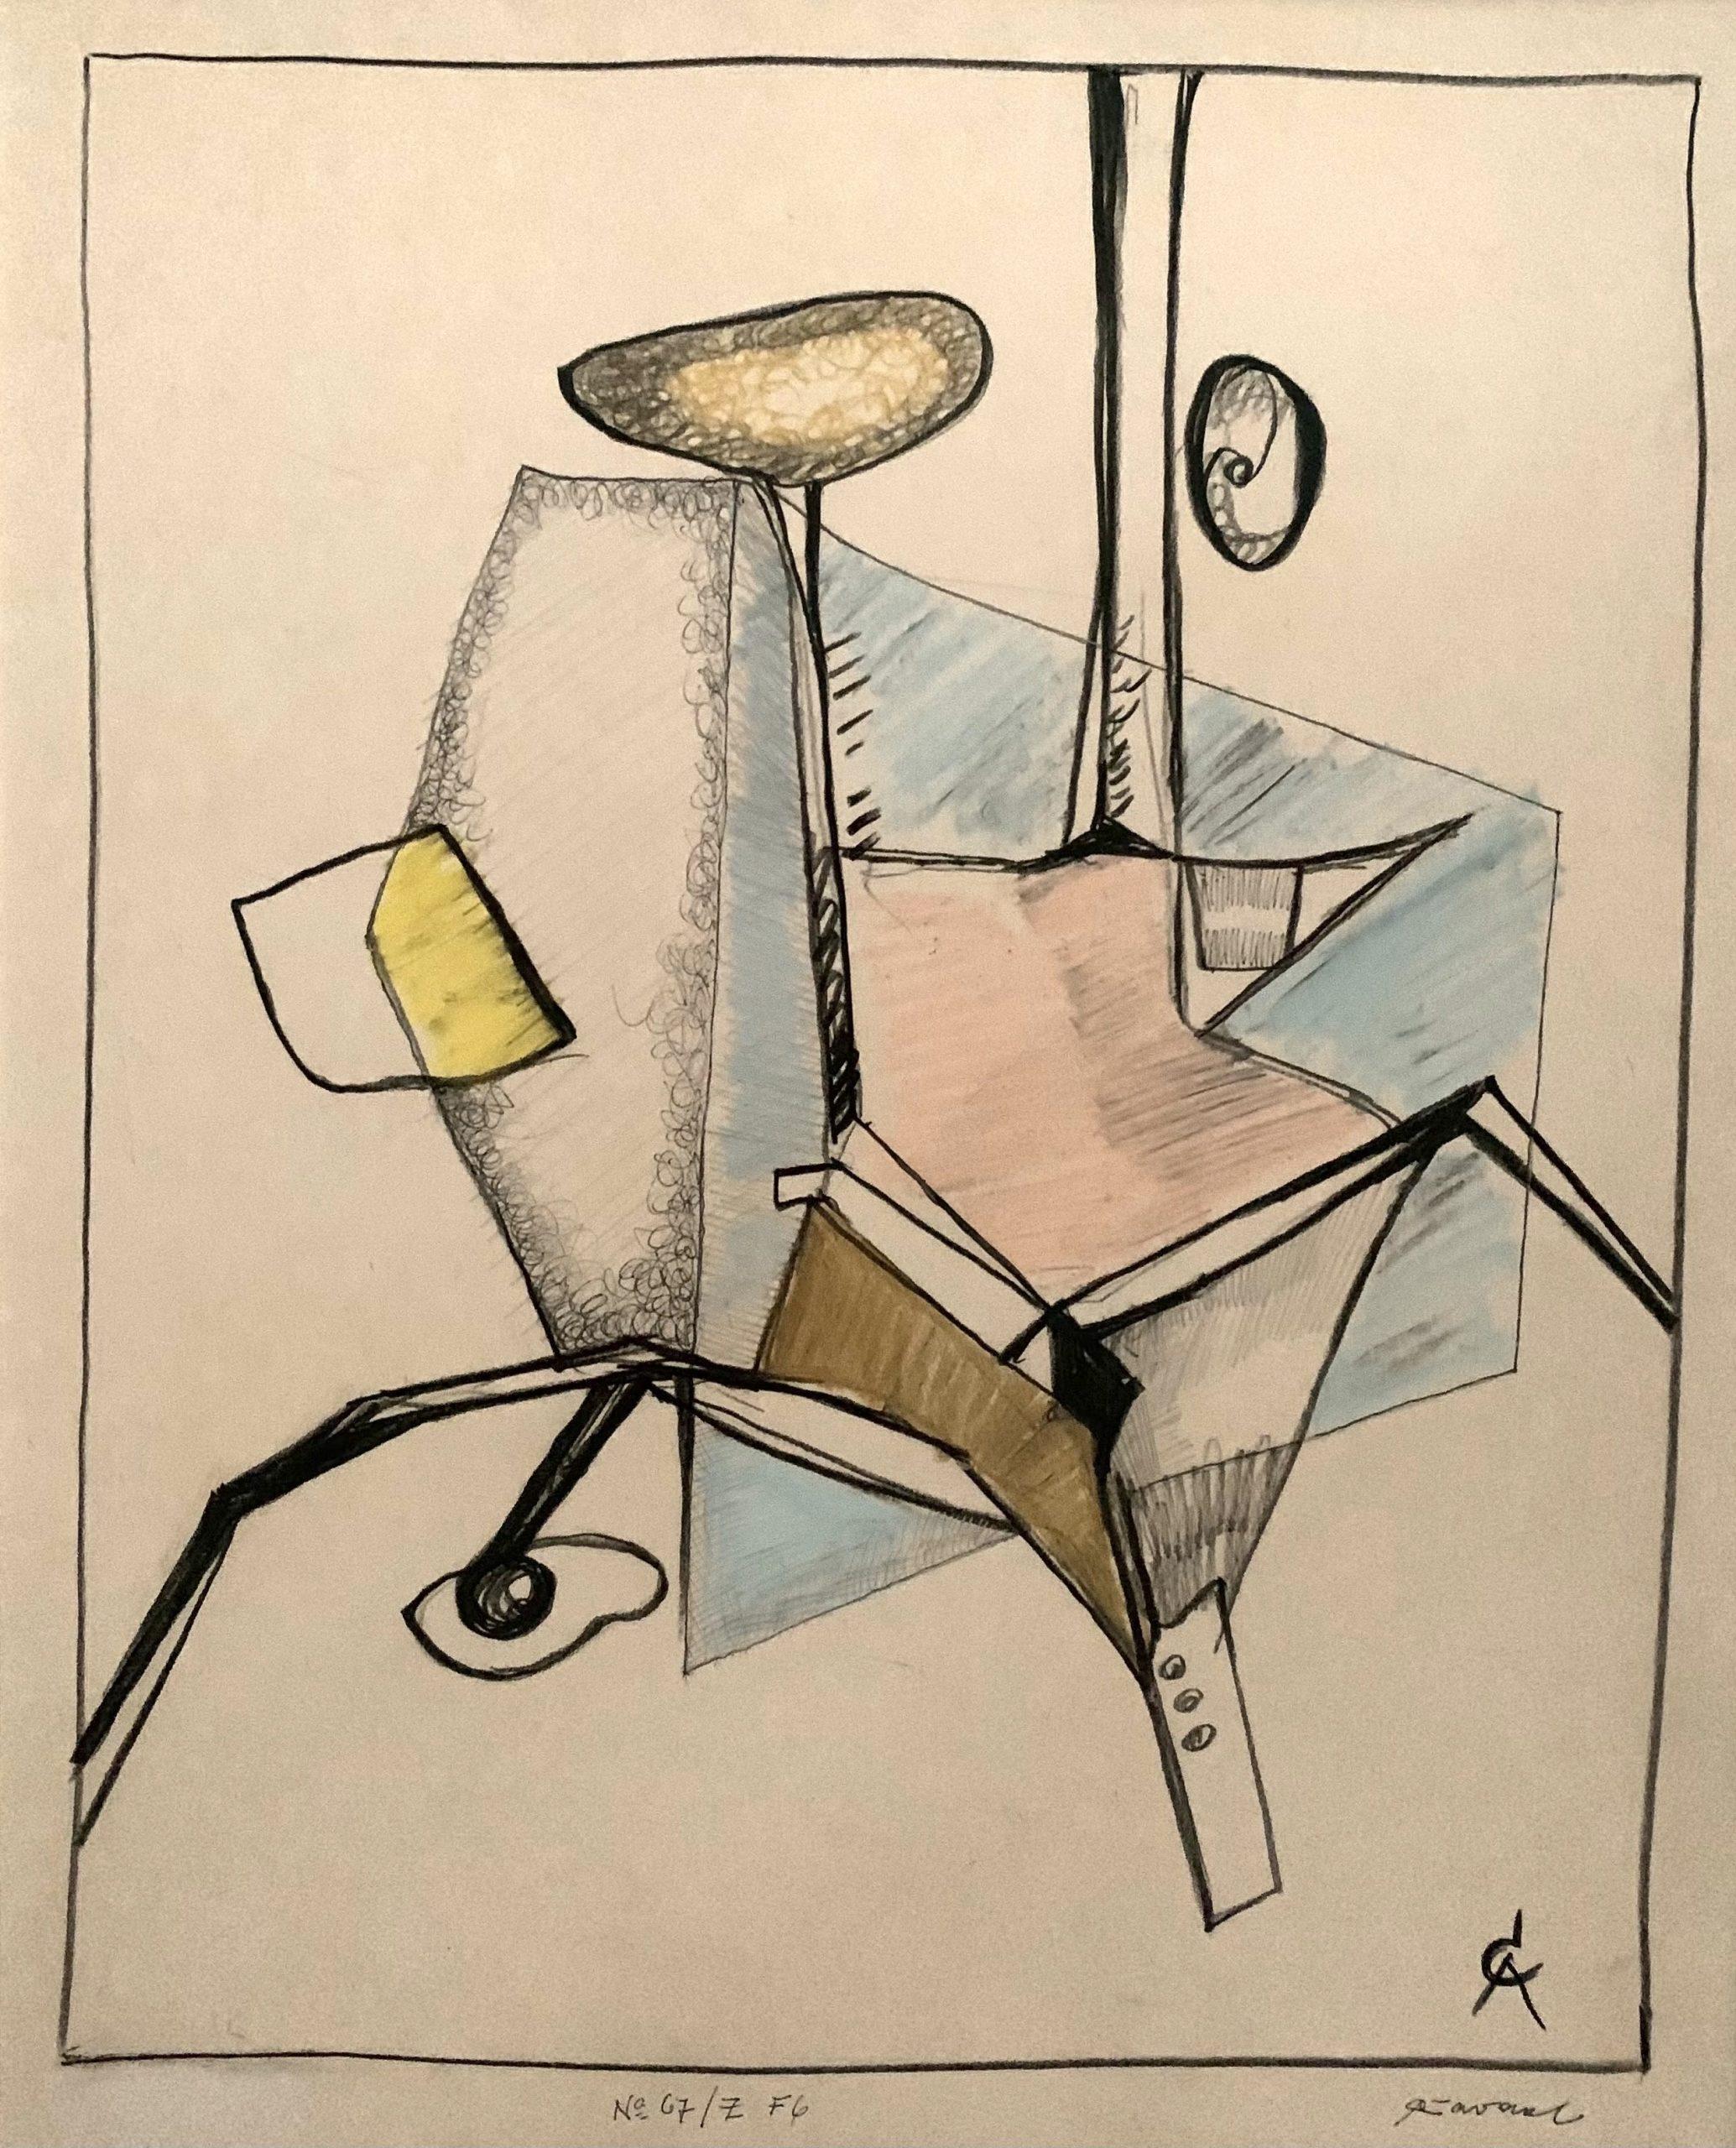 Galerie Maulberger Rolf Cavael (1967)